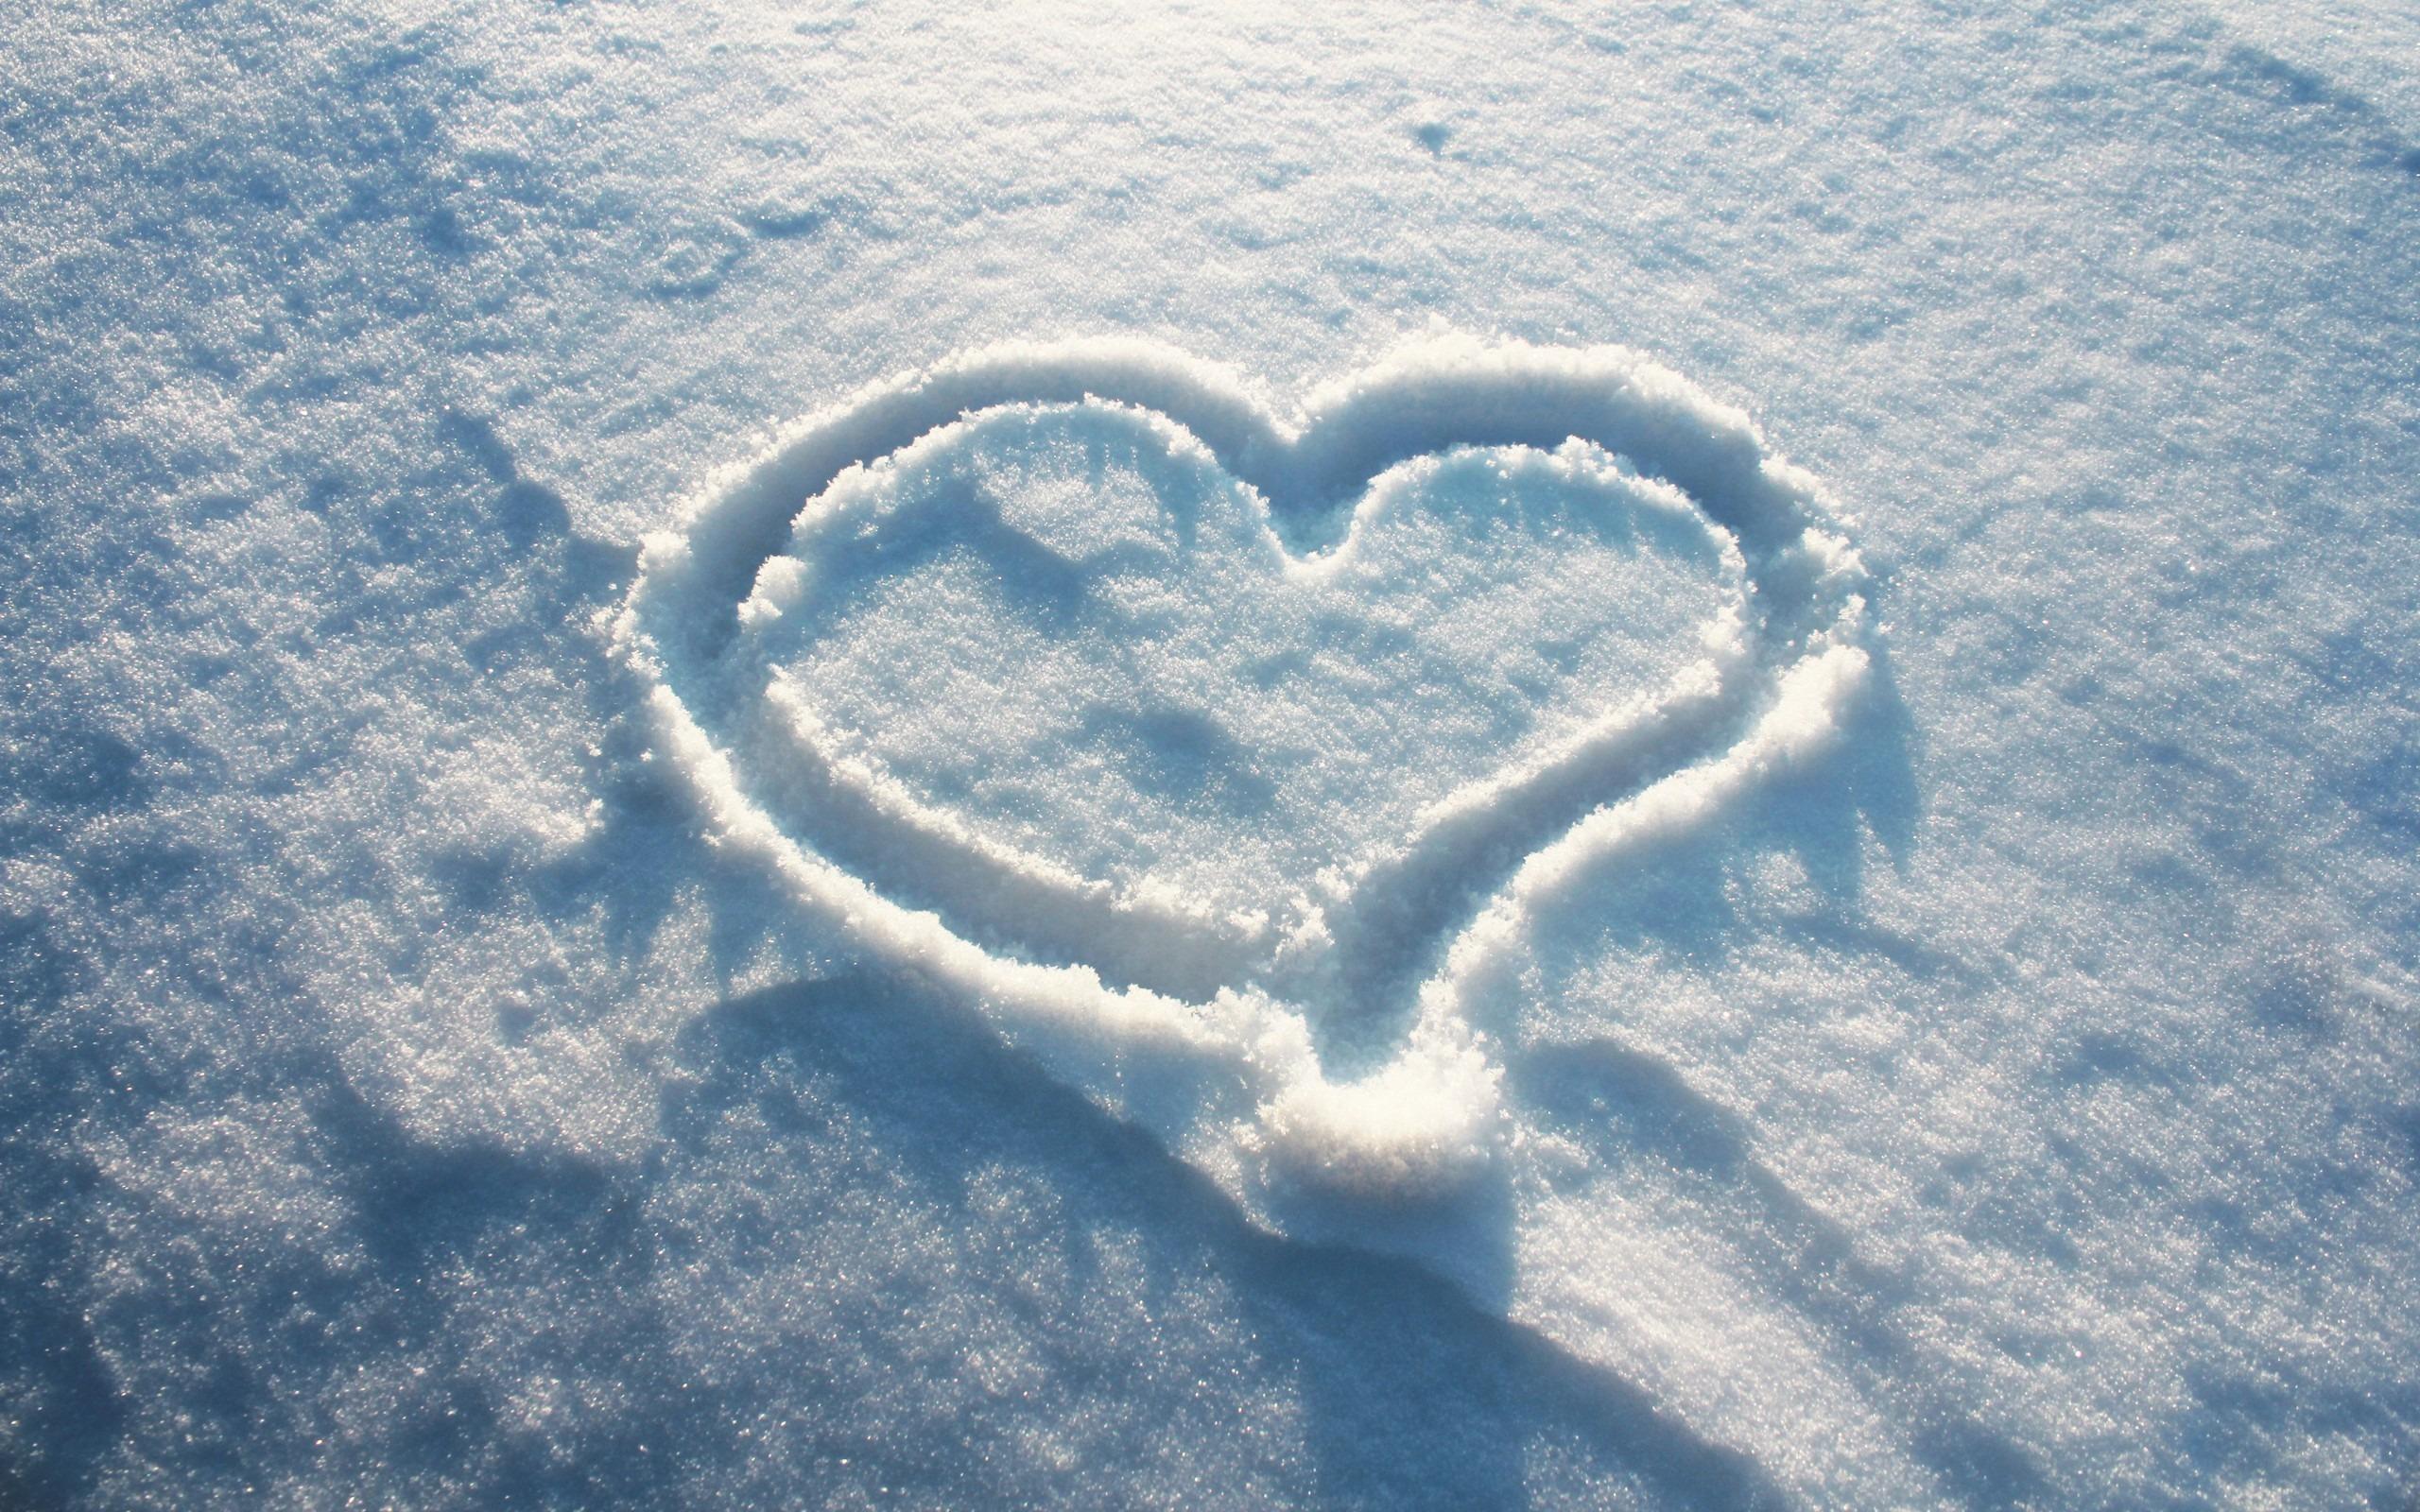 52596d301897fc7b49f9_7004968-love-heart-on-snow.jpg